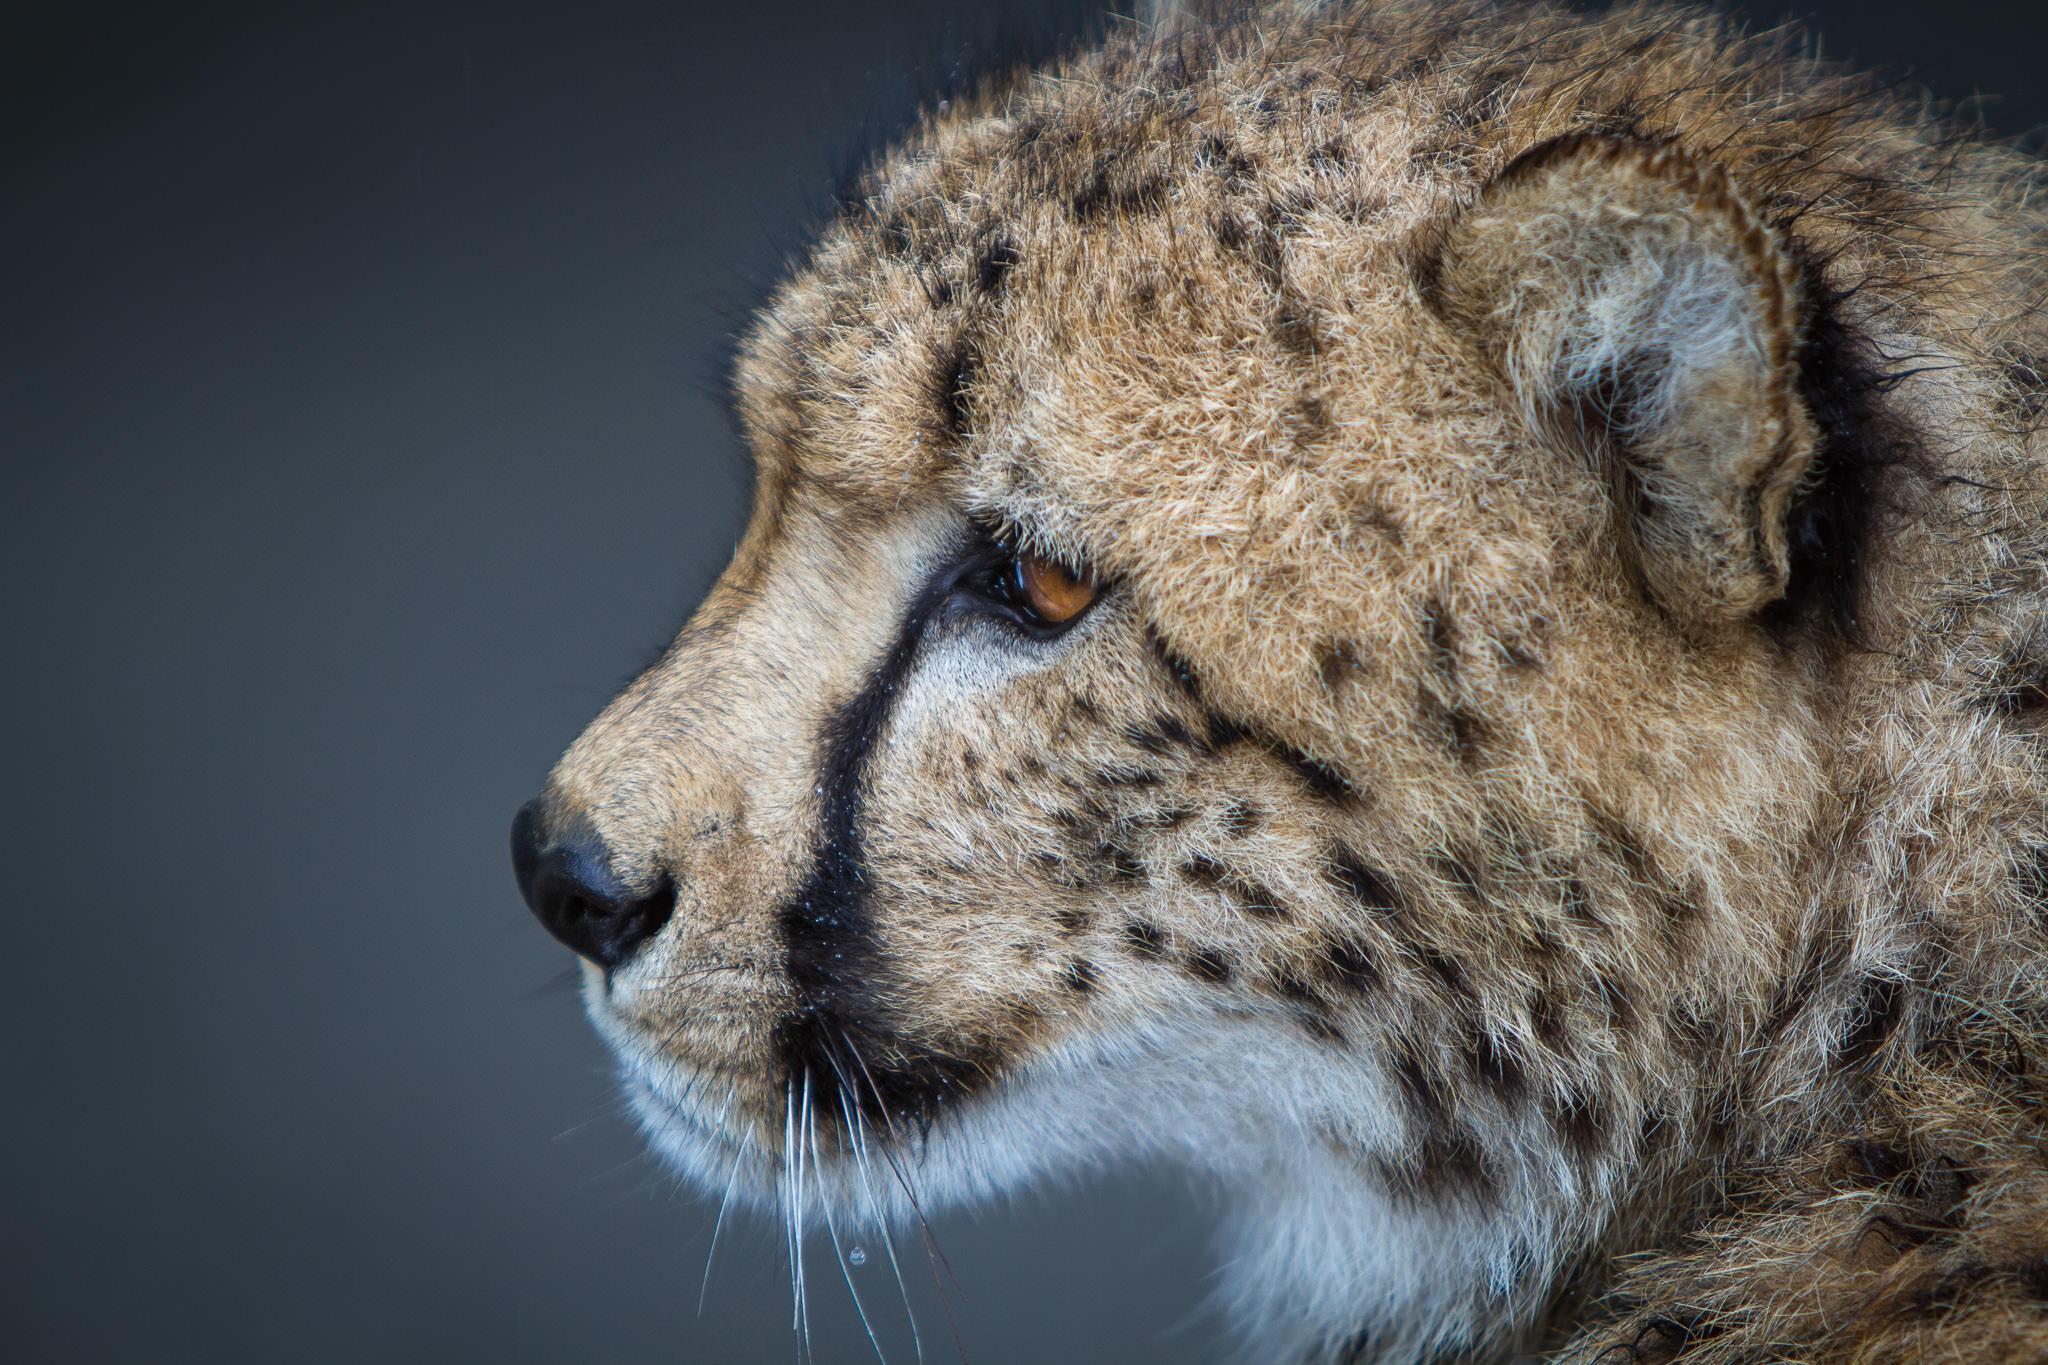 Cheetah #20130527_0161-3